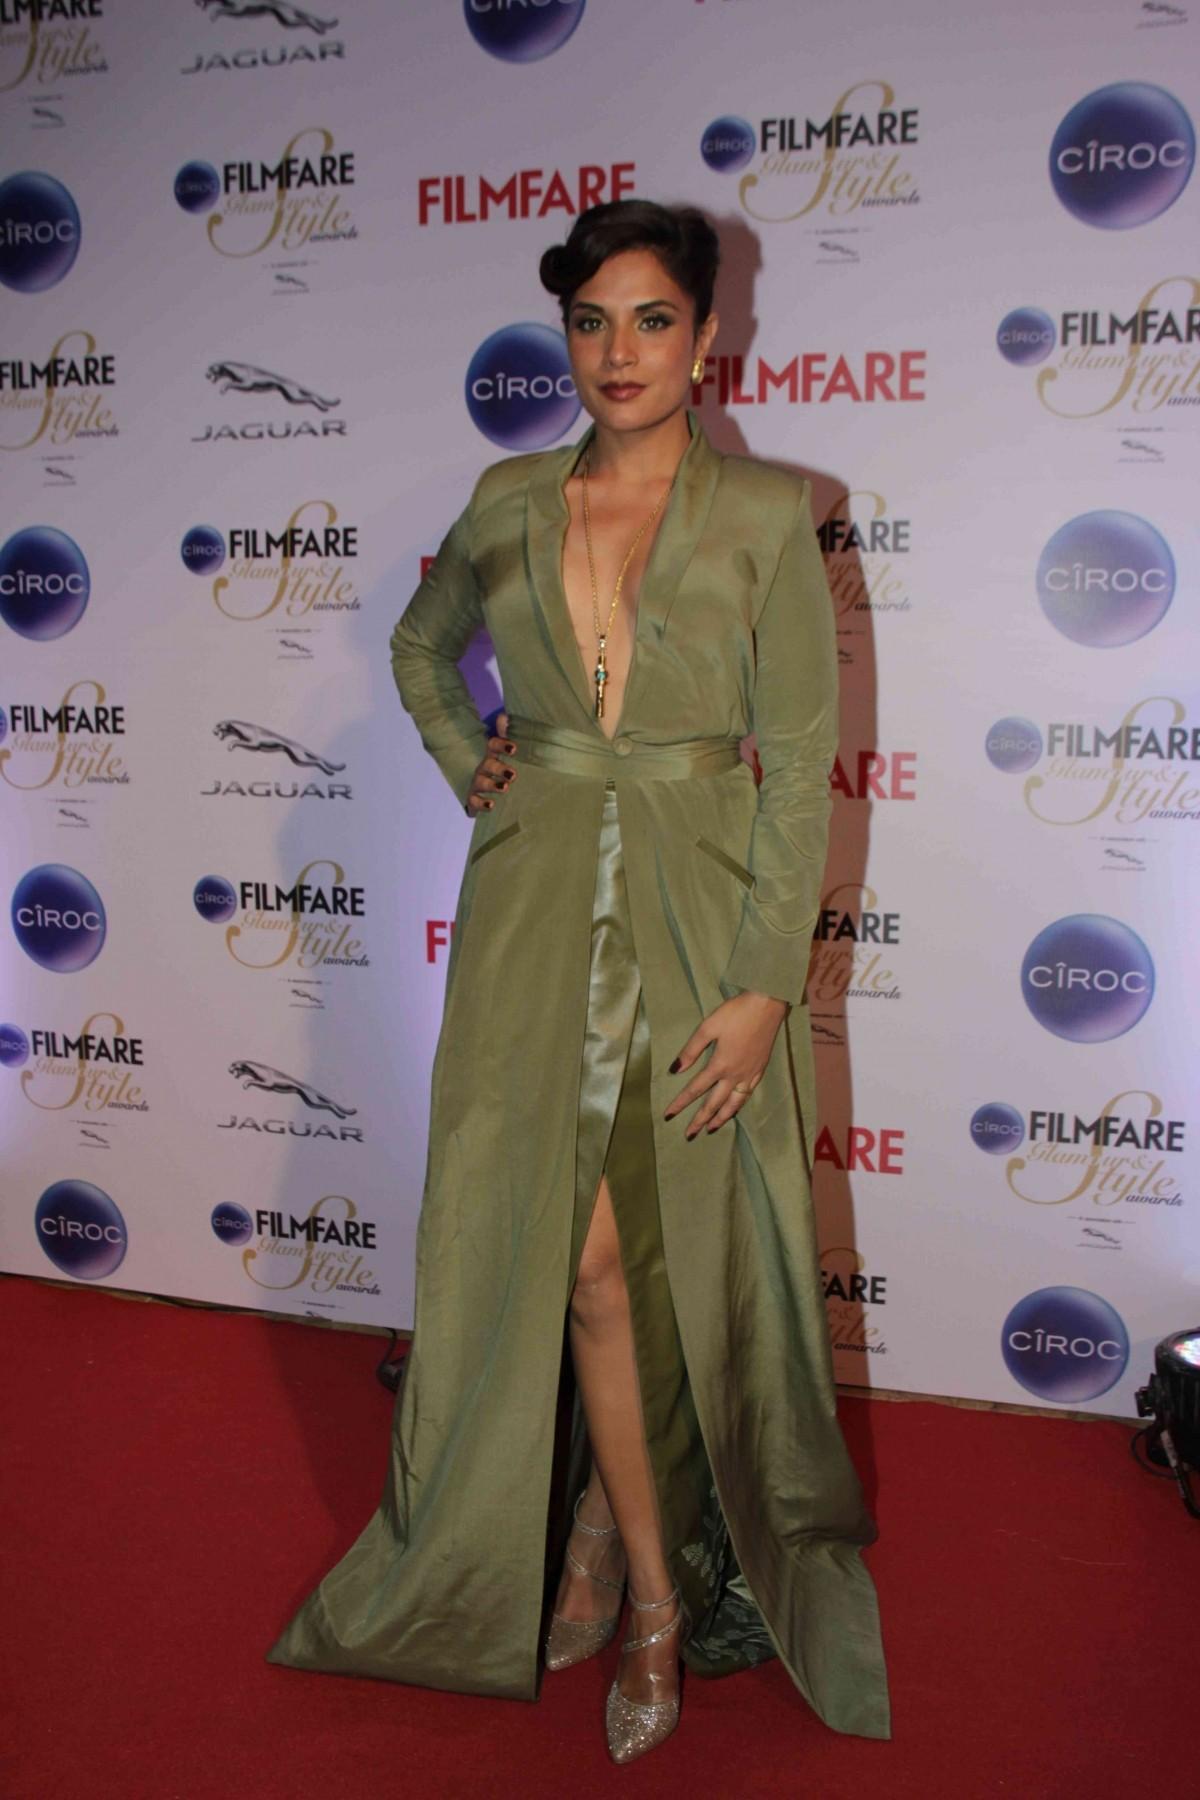 Kareena Kapoor Khan, Jacqueline Fernandez, Alia Bhatt and Other Best Dressed Divas at Filmfare Glamour And Style Awards 2015